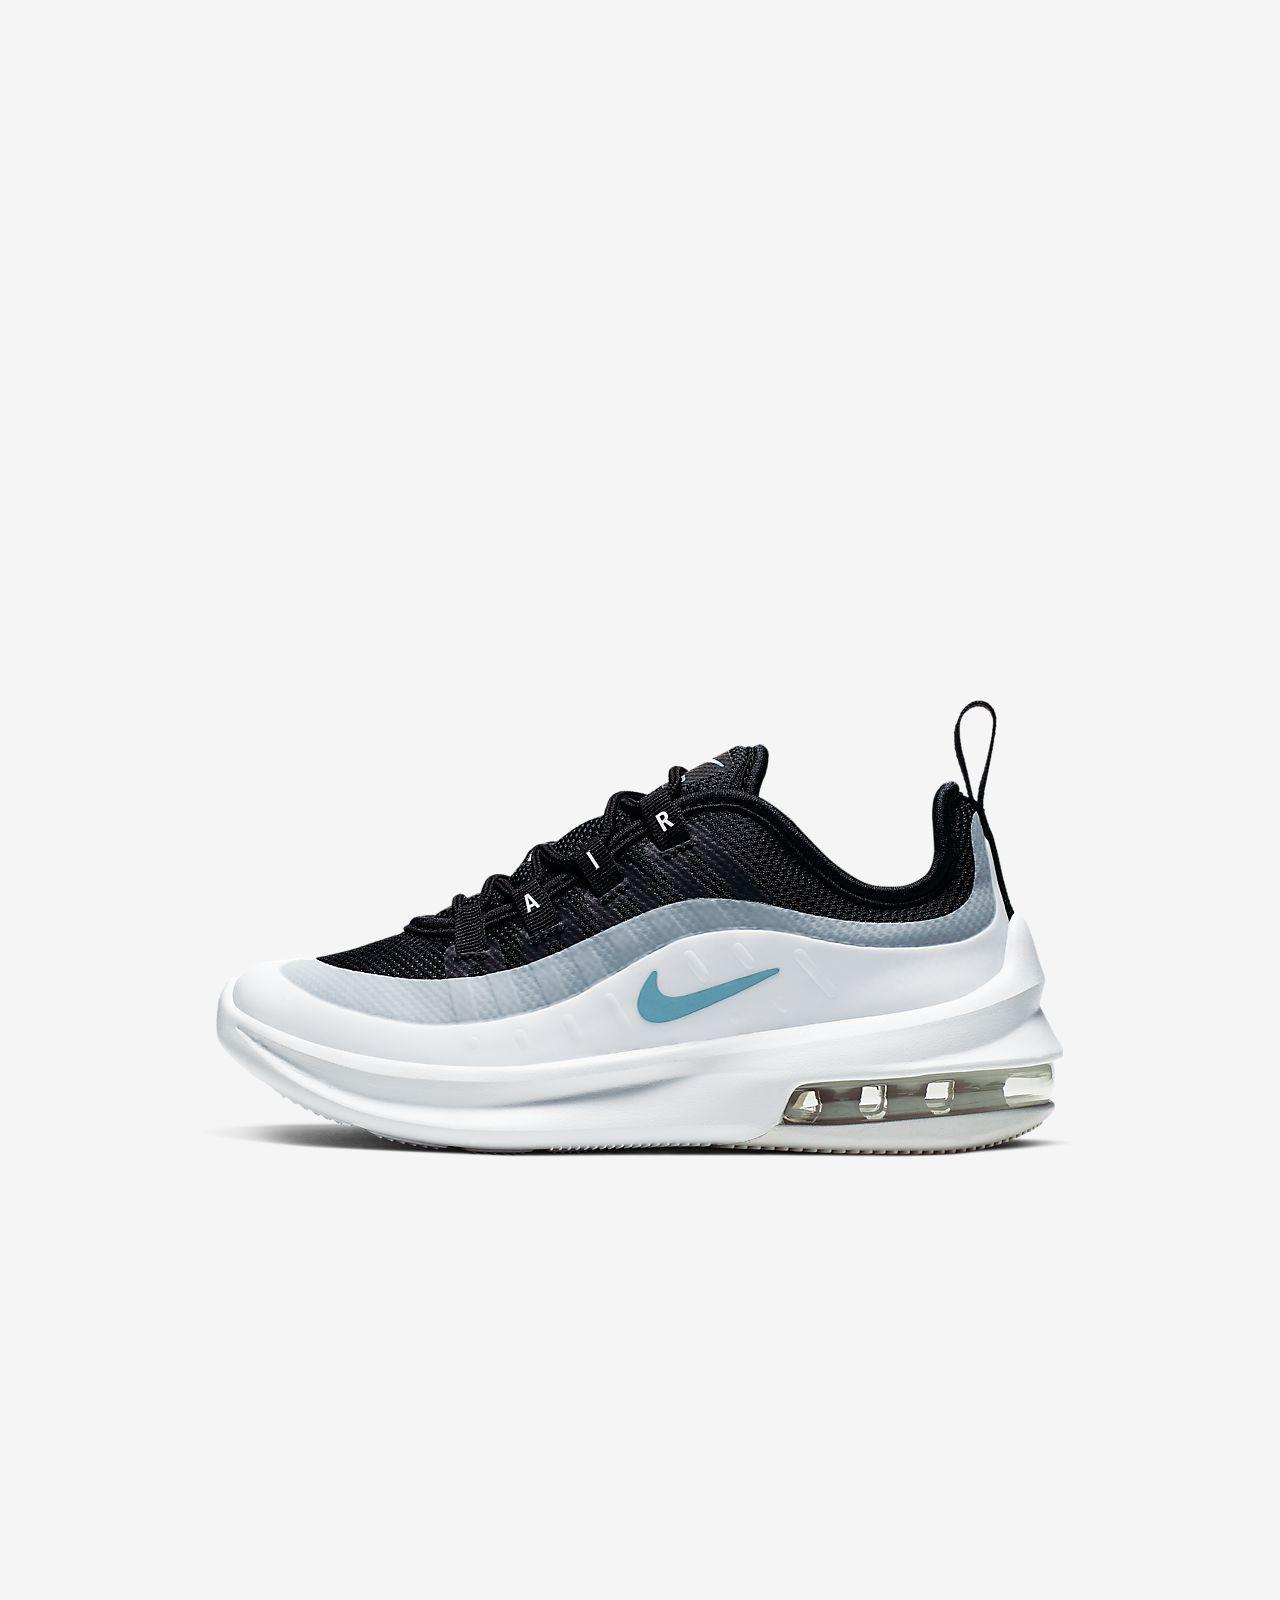 Nike Air Max Axis Küçük Çocuk Ayakkabısı